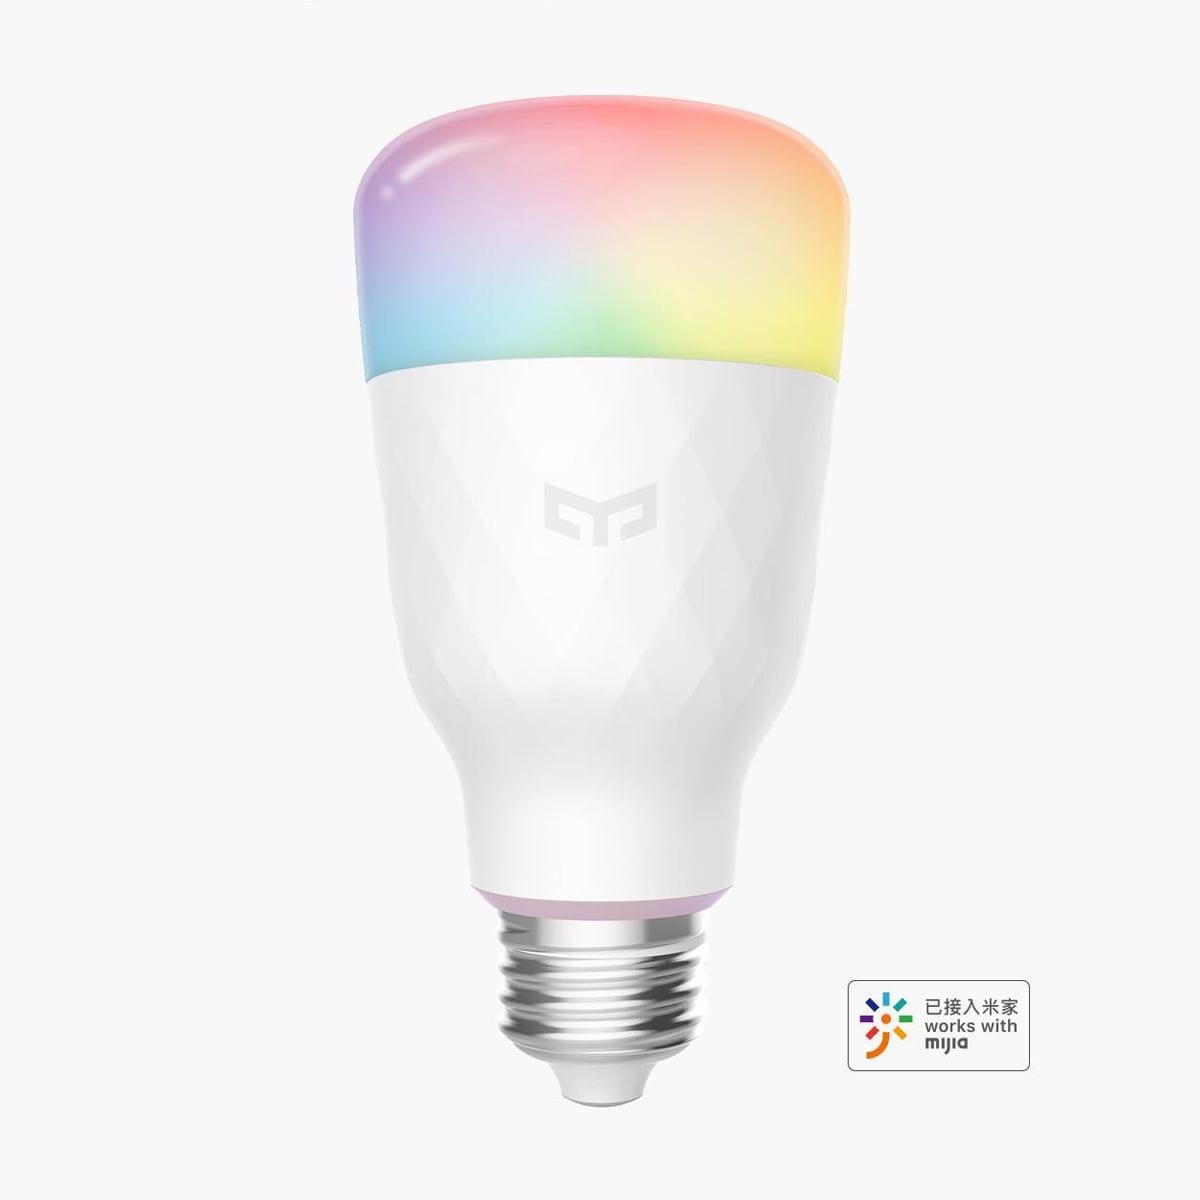 Yeelight presents Details of Improved Colour Smart Bulb